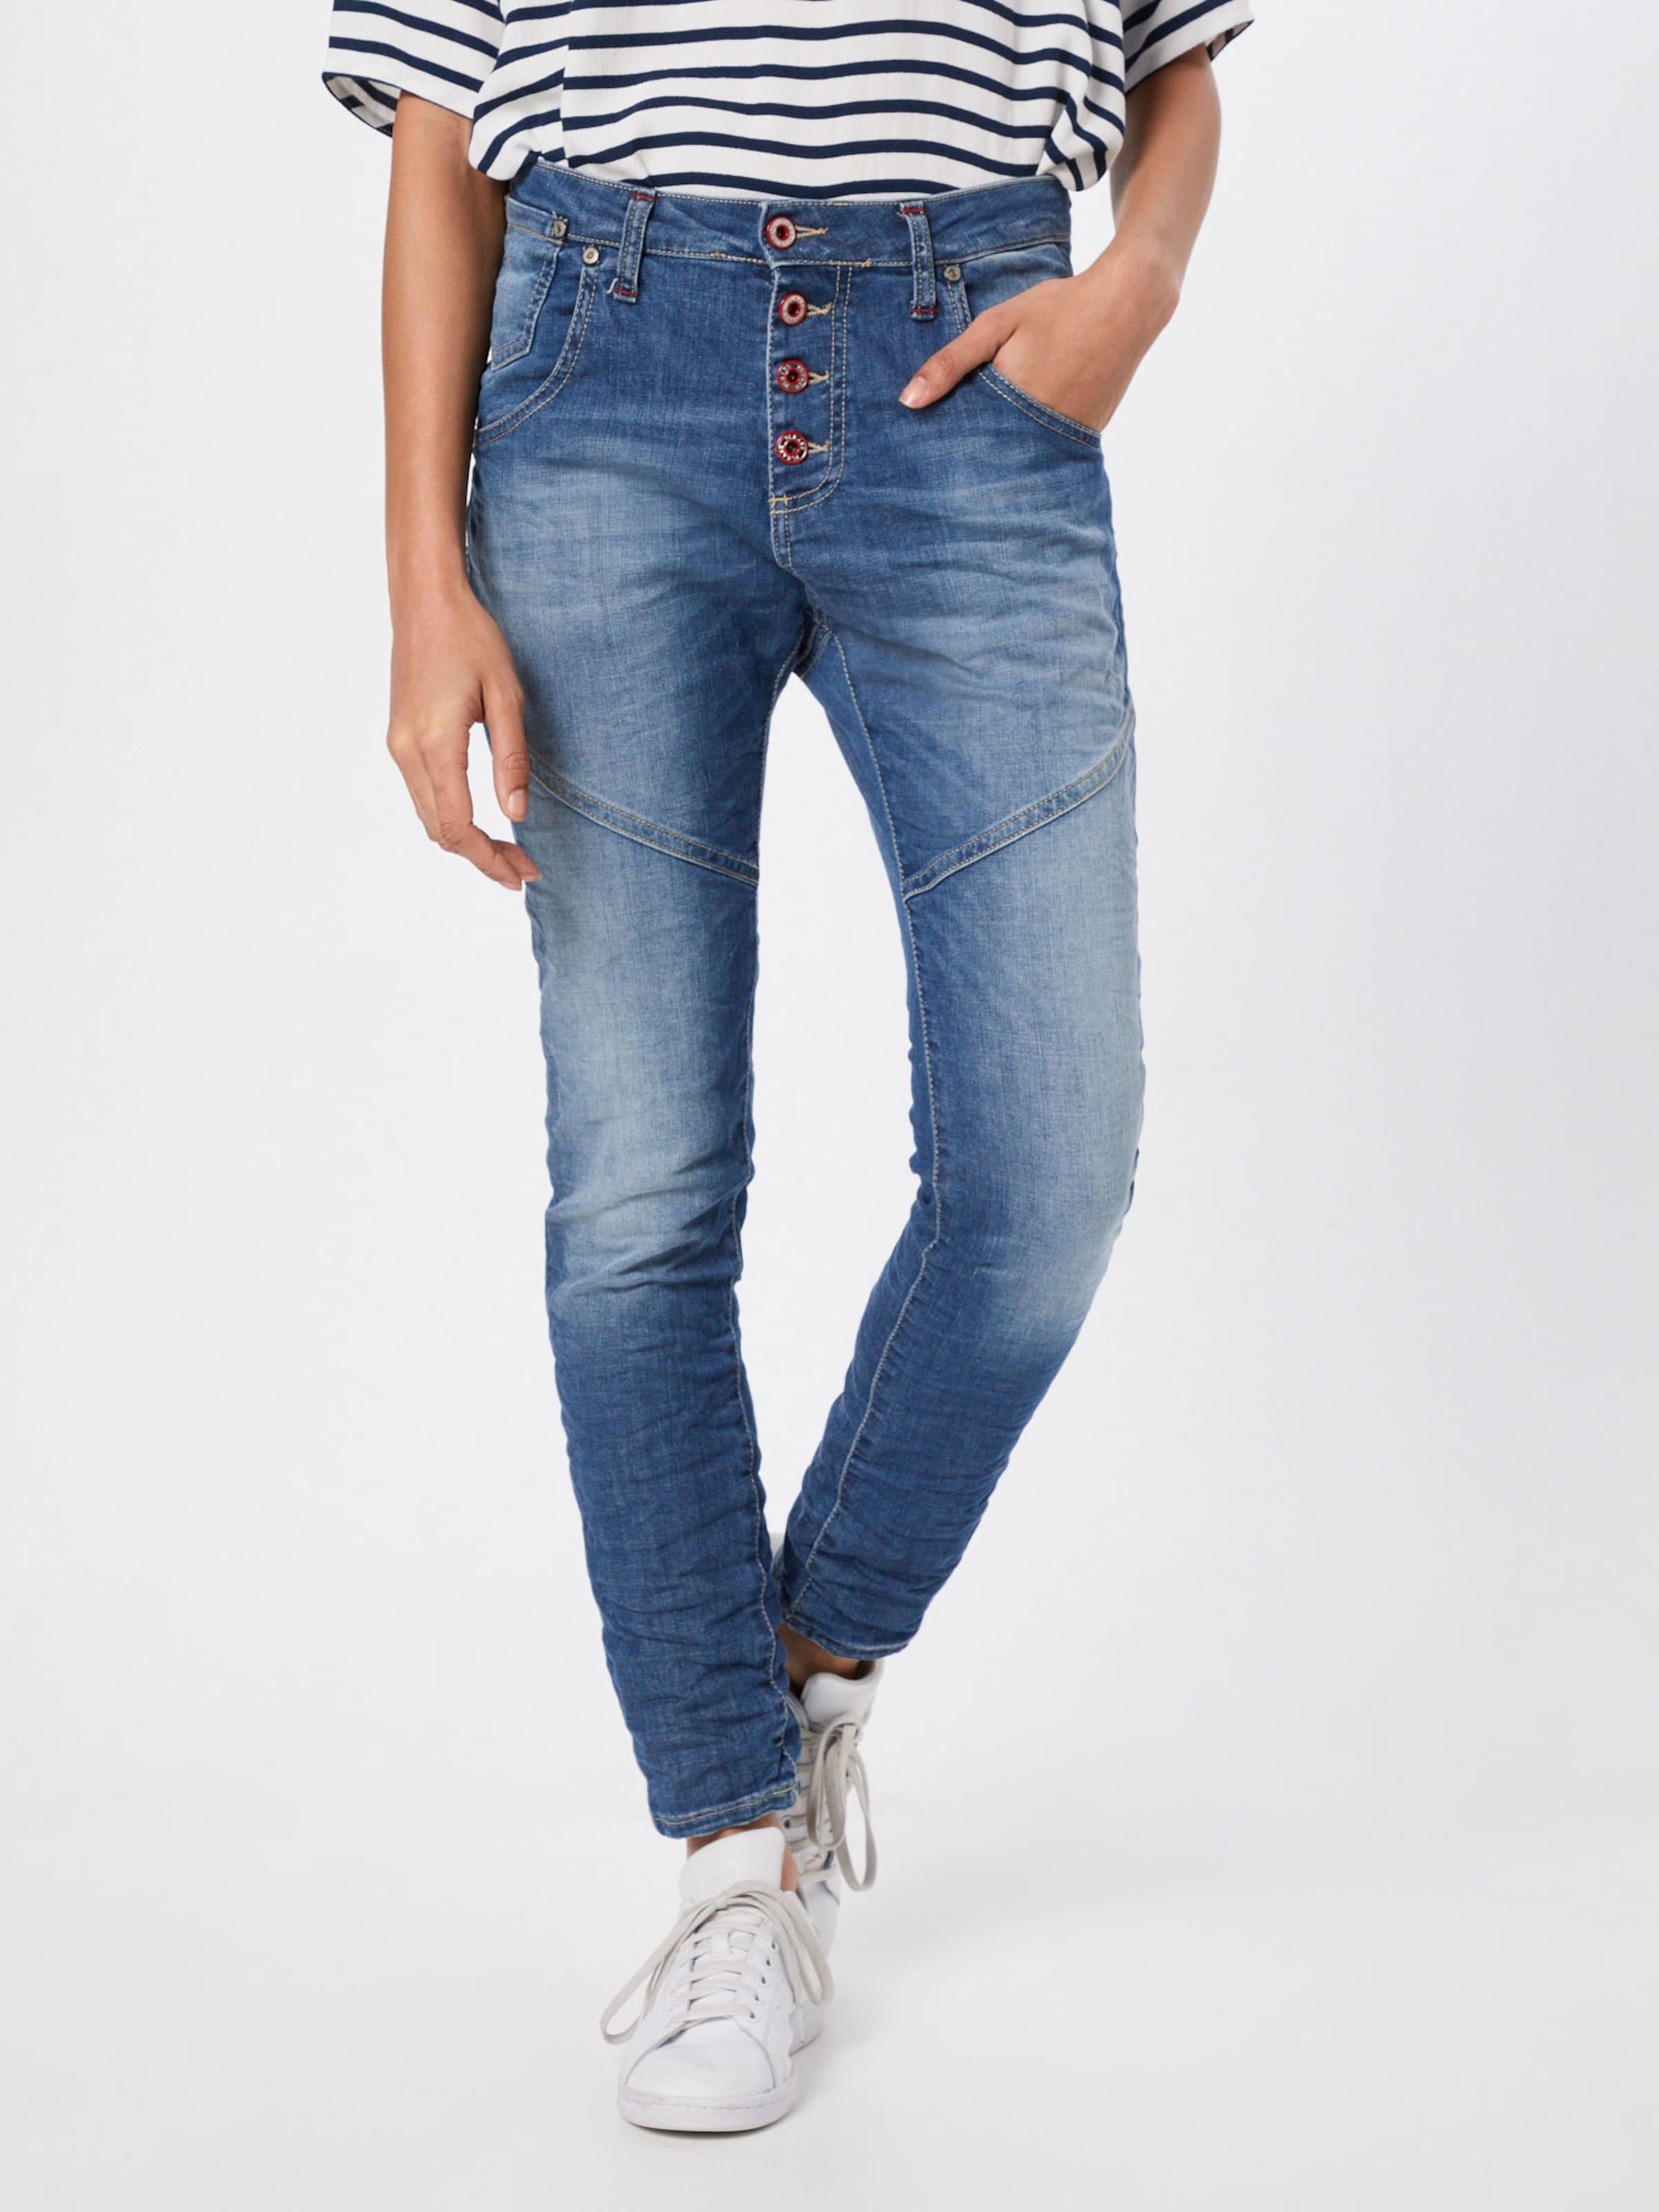 'trousers' In Please Blue Jeans Denim 7gf6yb